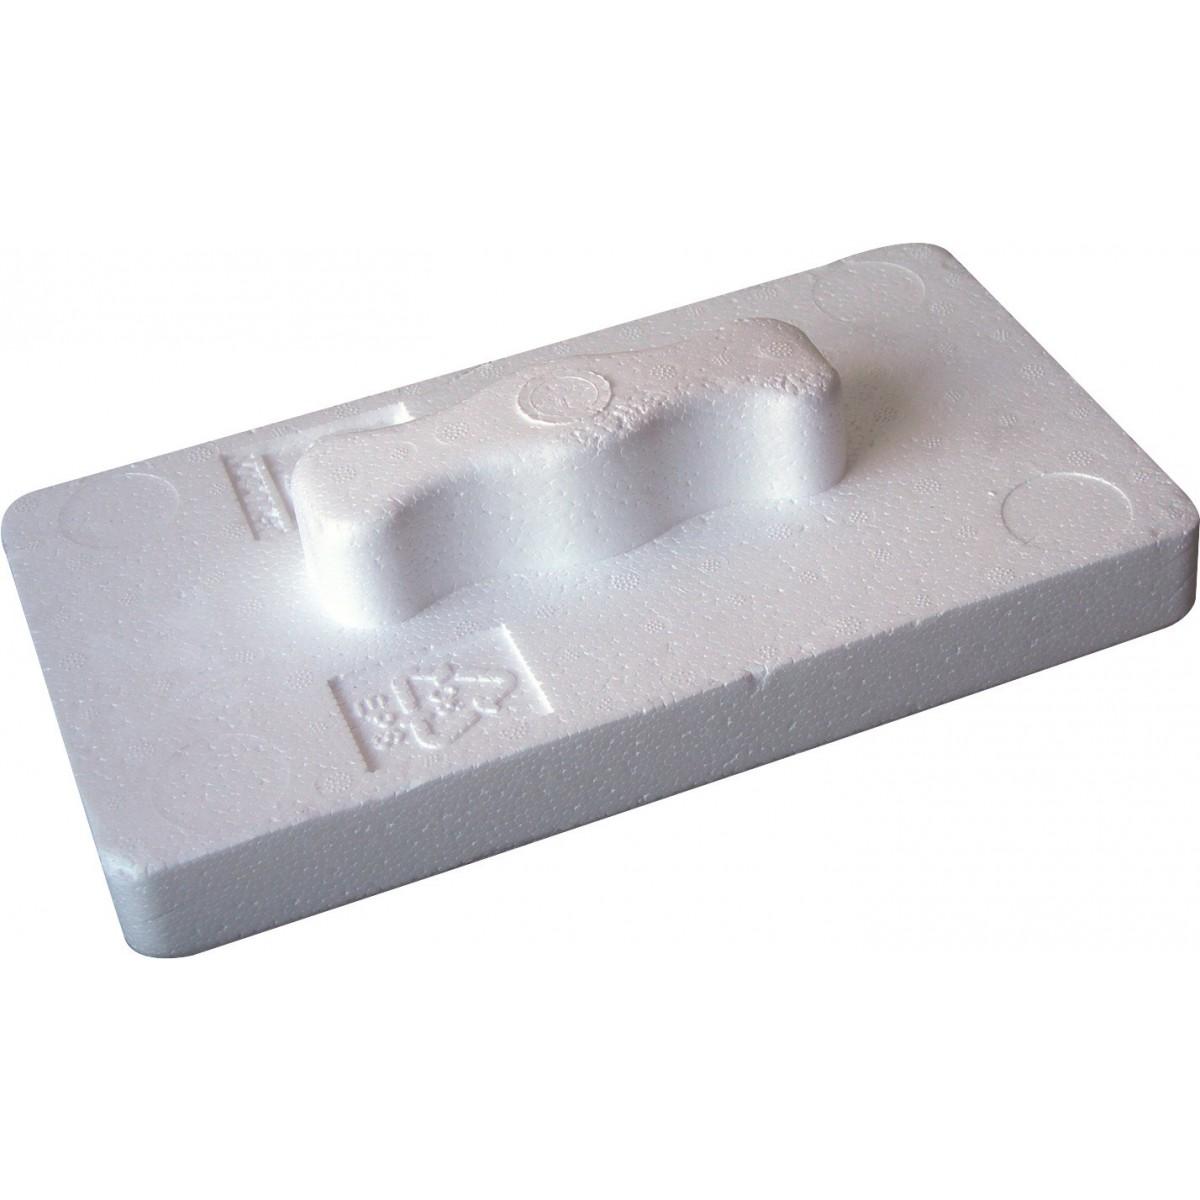 Taloche polystyrène expansé Outibat - Dimensions 20 x 15 cm